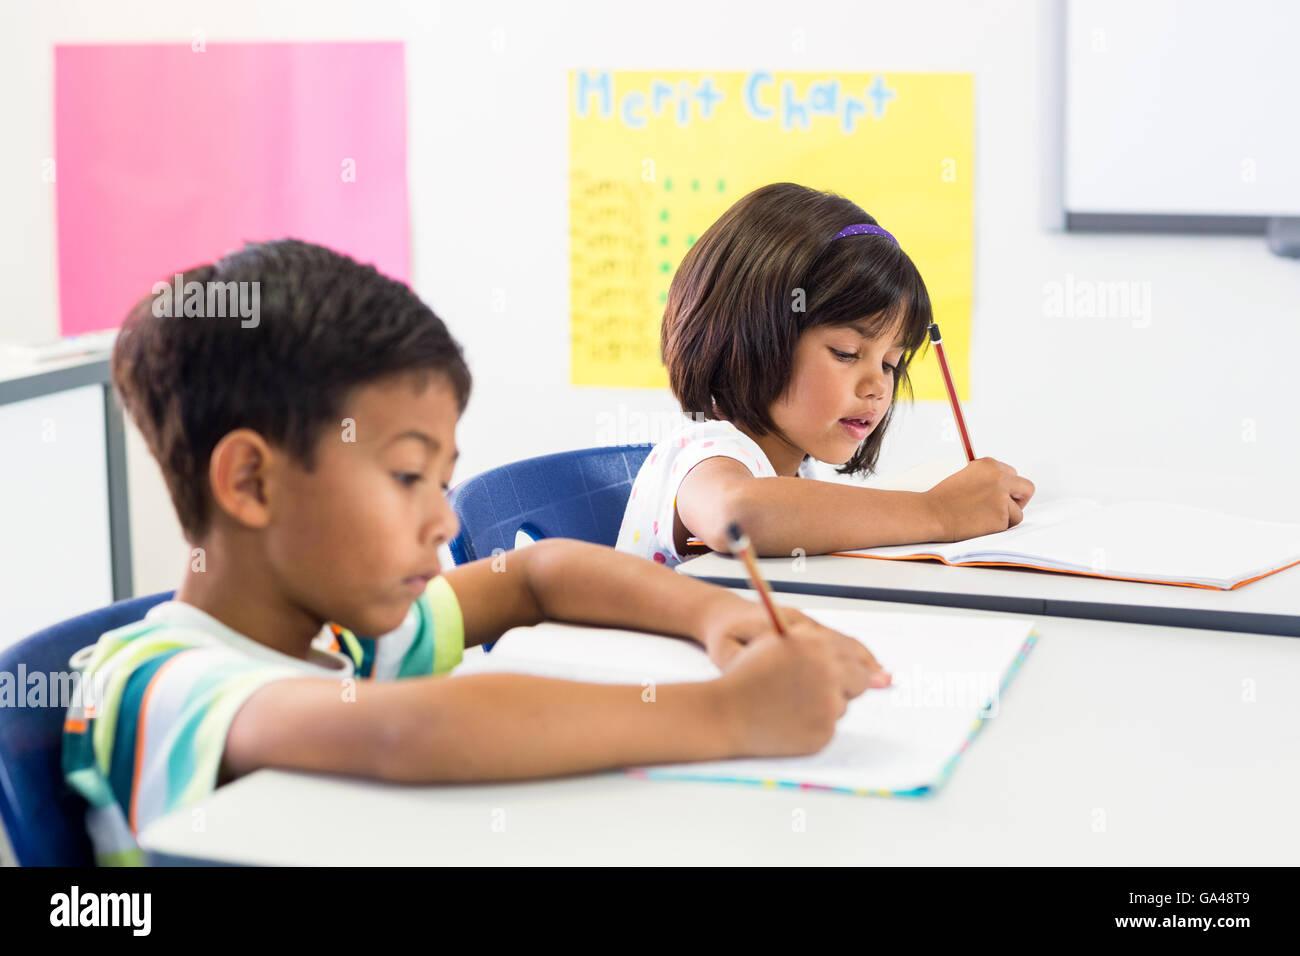 Schoolchildren writing on books - Stock Image